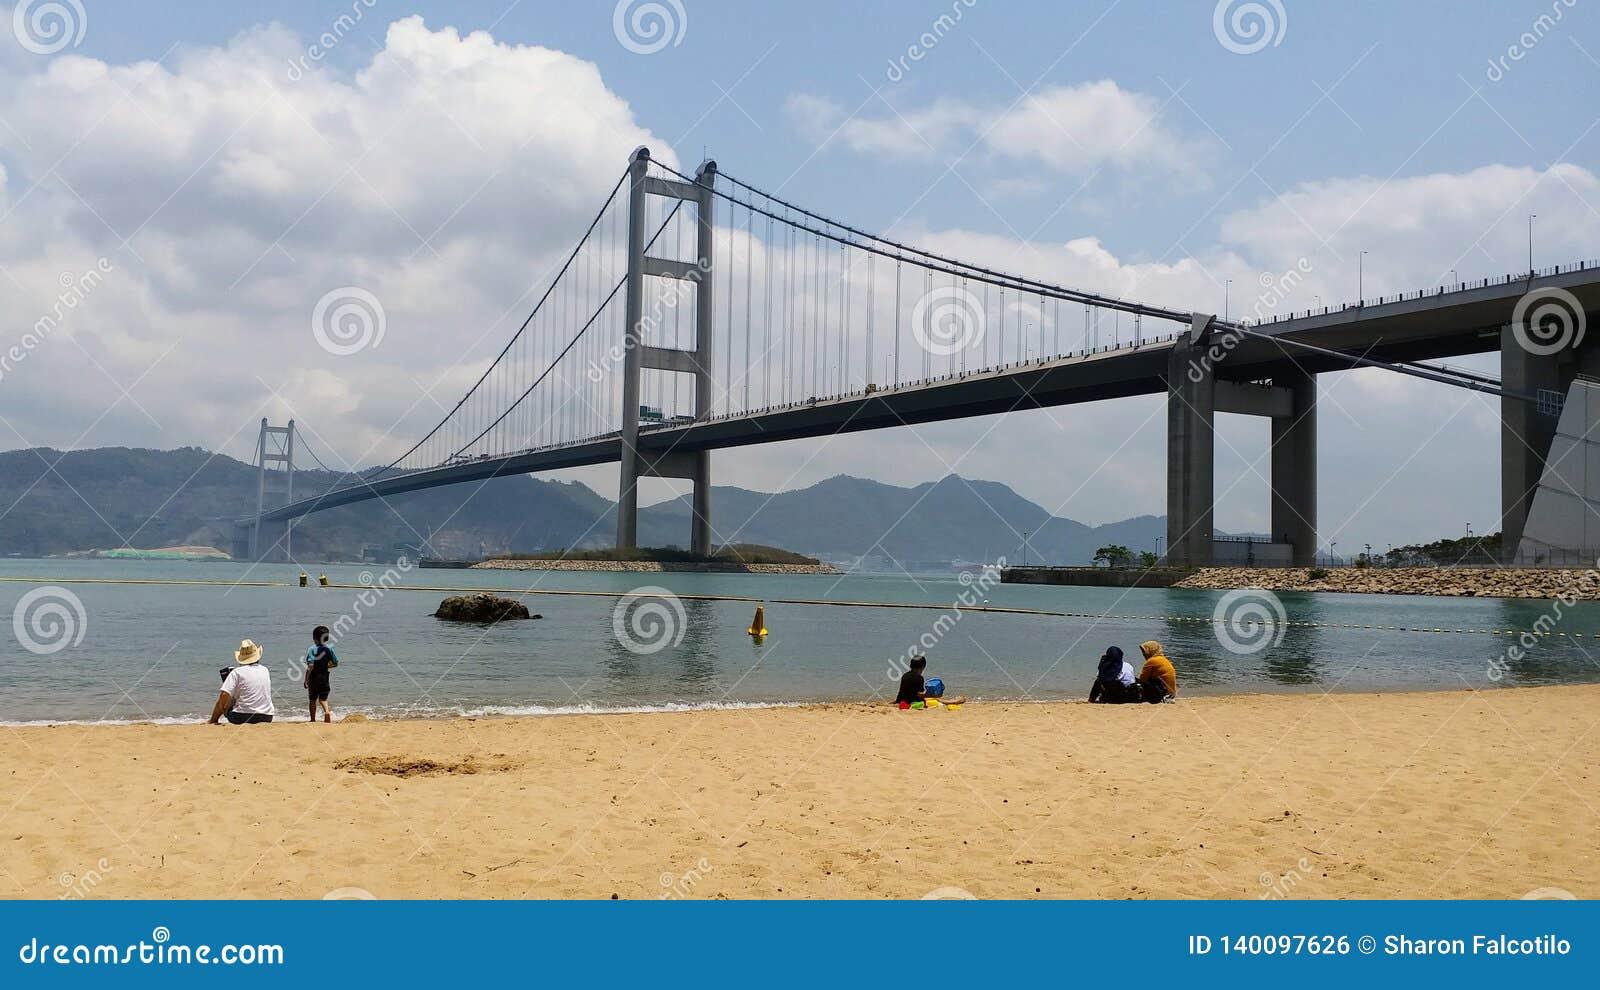 Tsing Ma Bridge, MA fahl, Park-Insel, Hong Kong